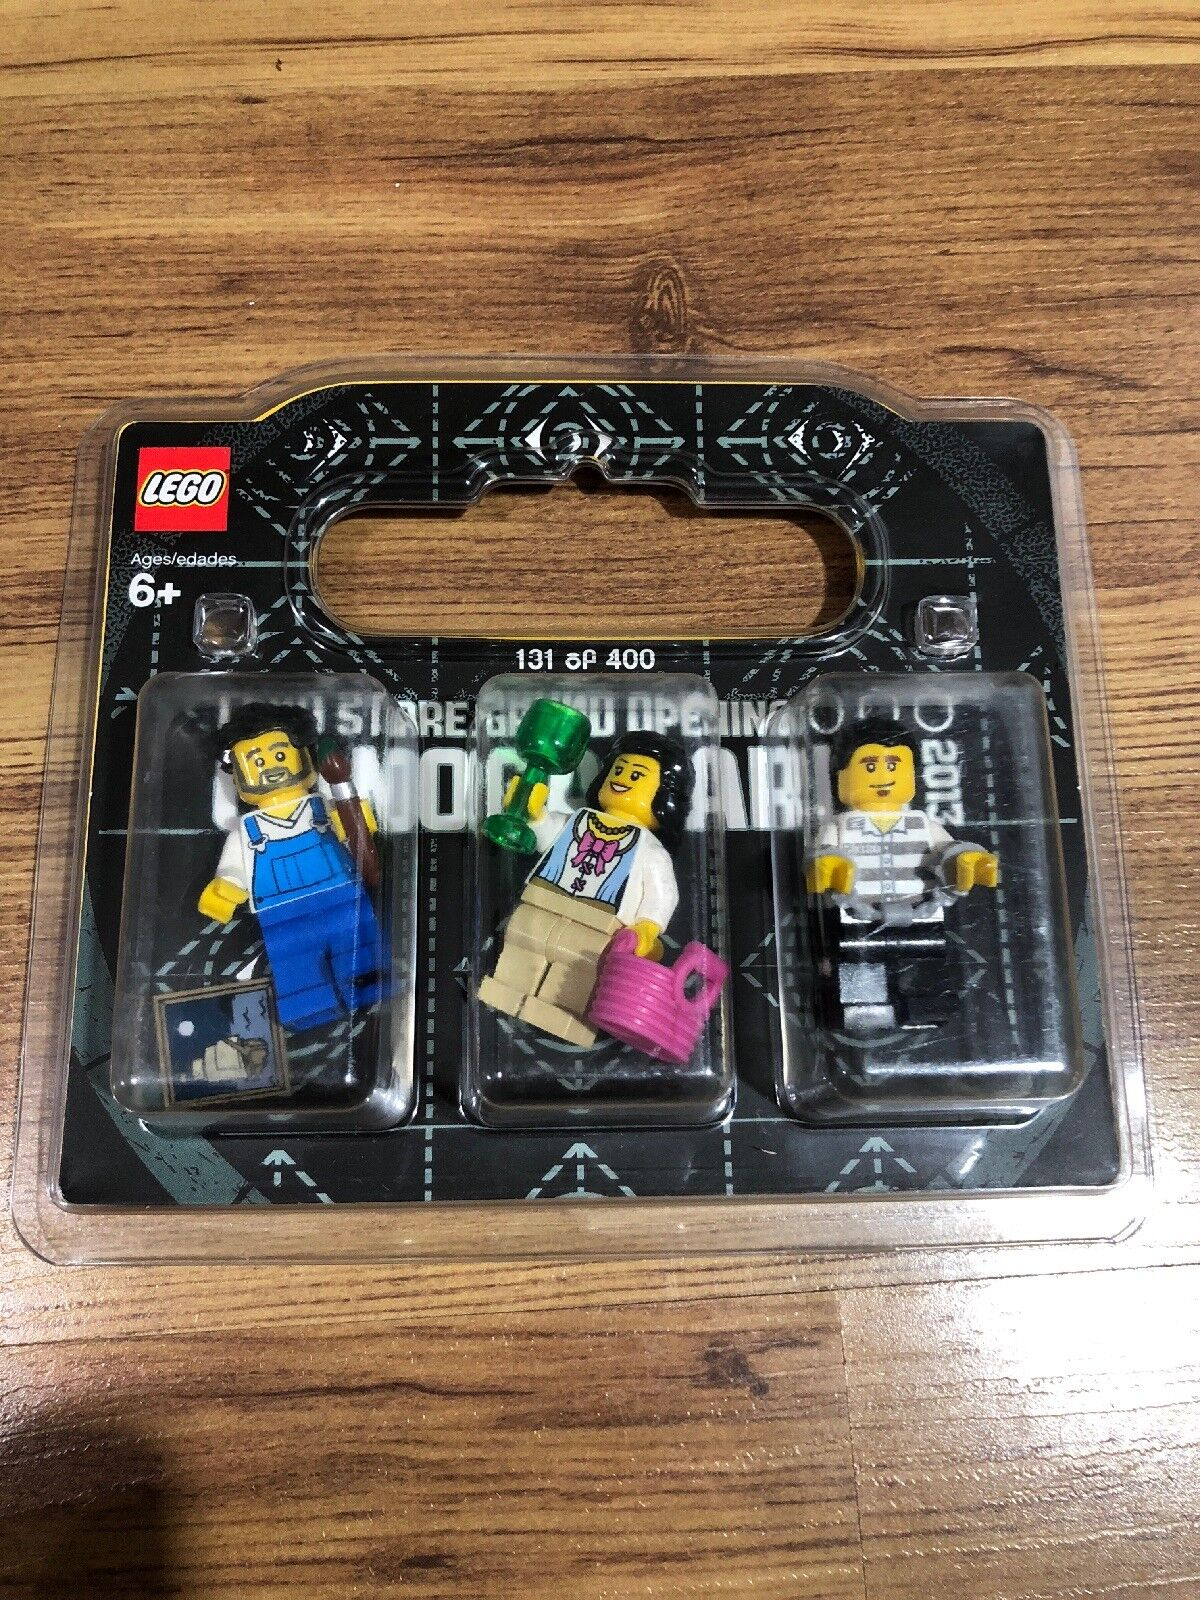 LEGO Store Grand Opening Minifigure Canoga Park 2013 Rare Limited 131/400